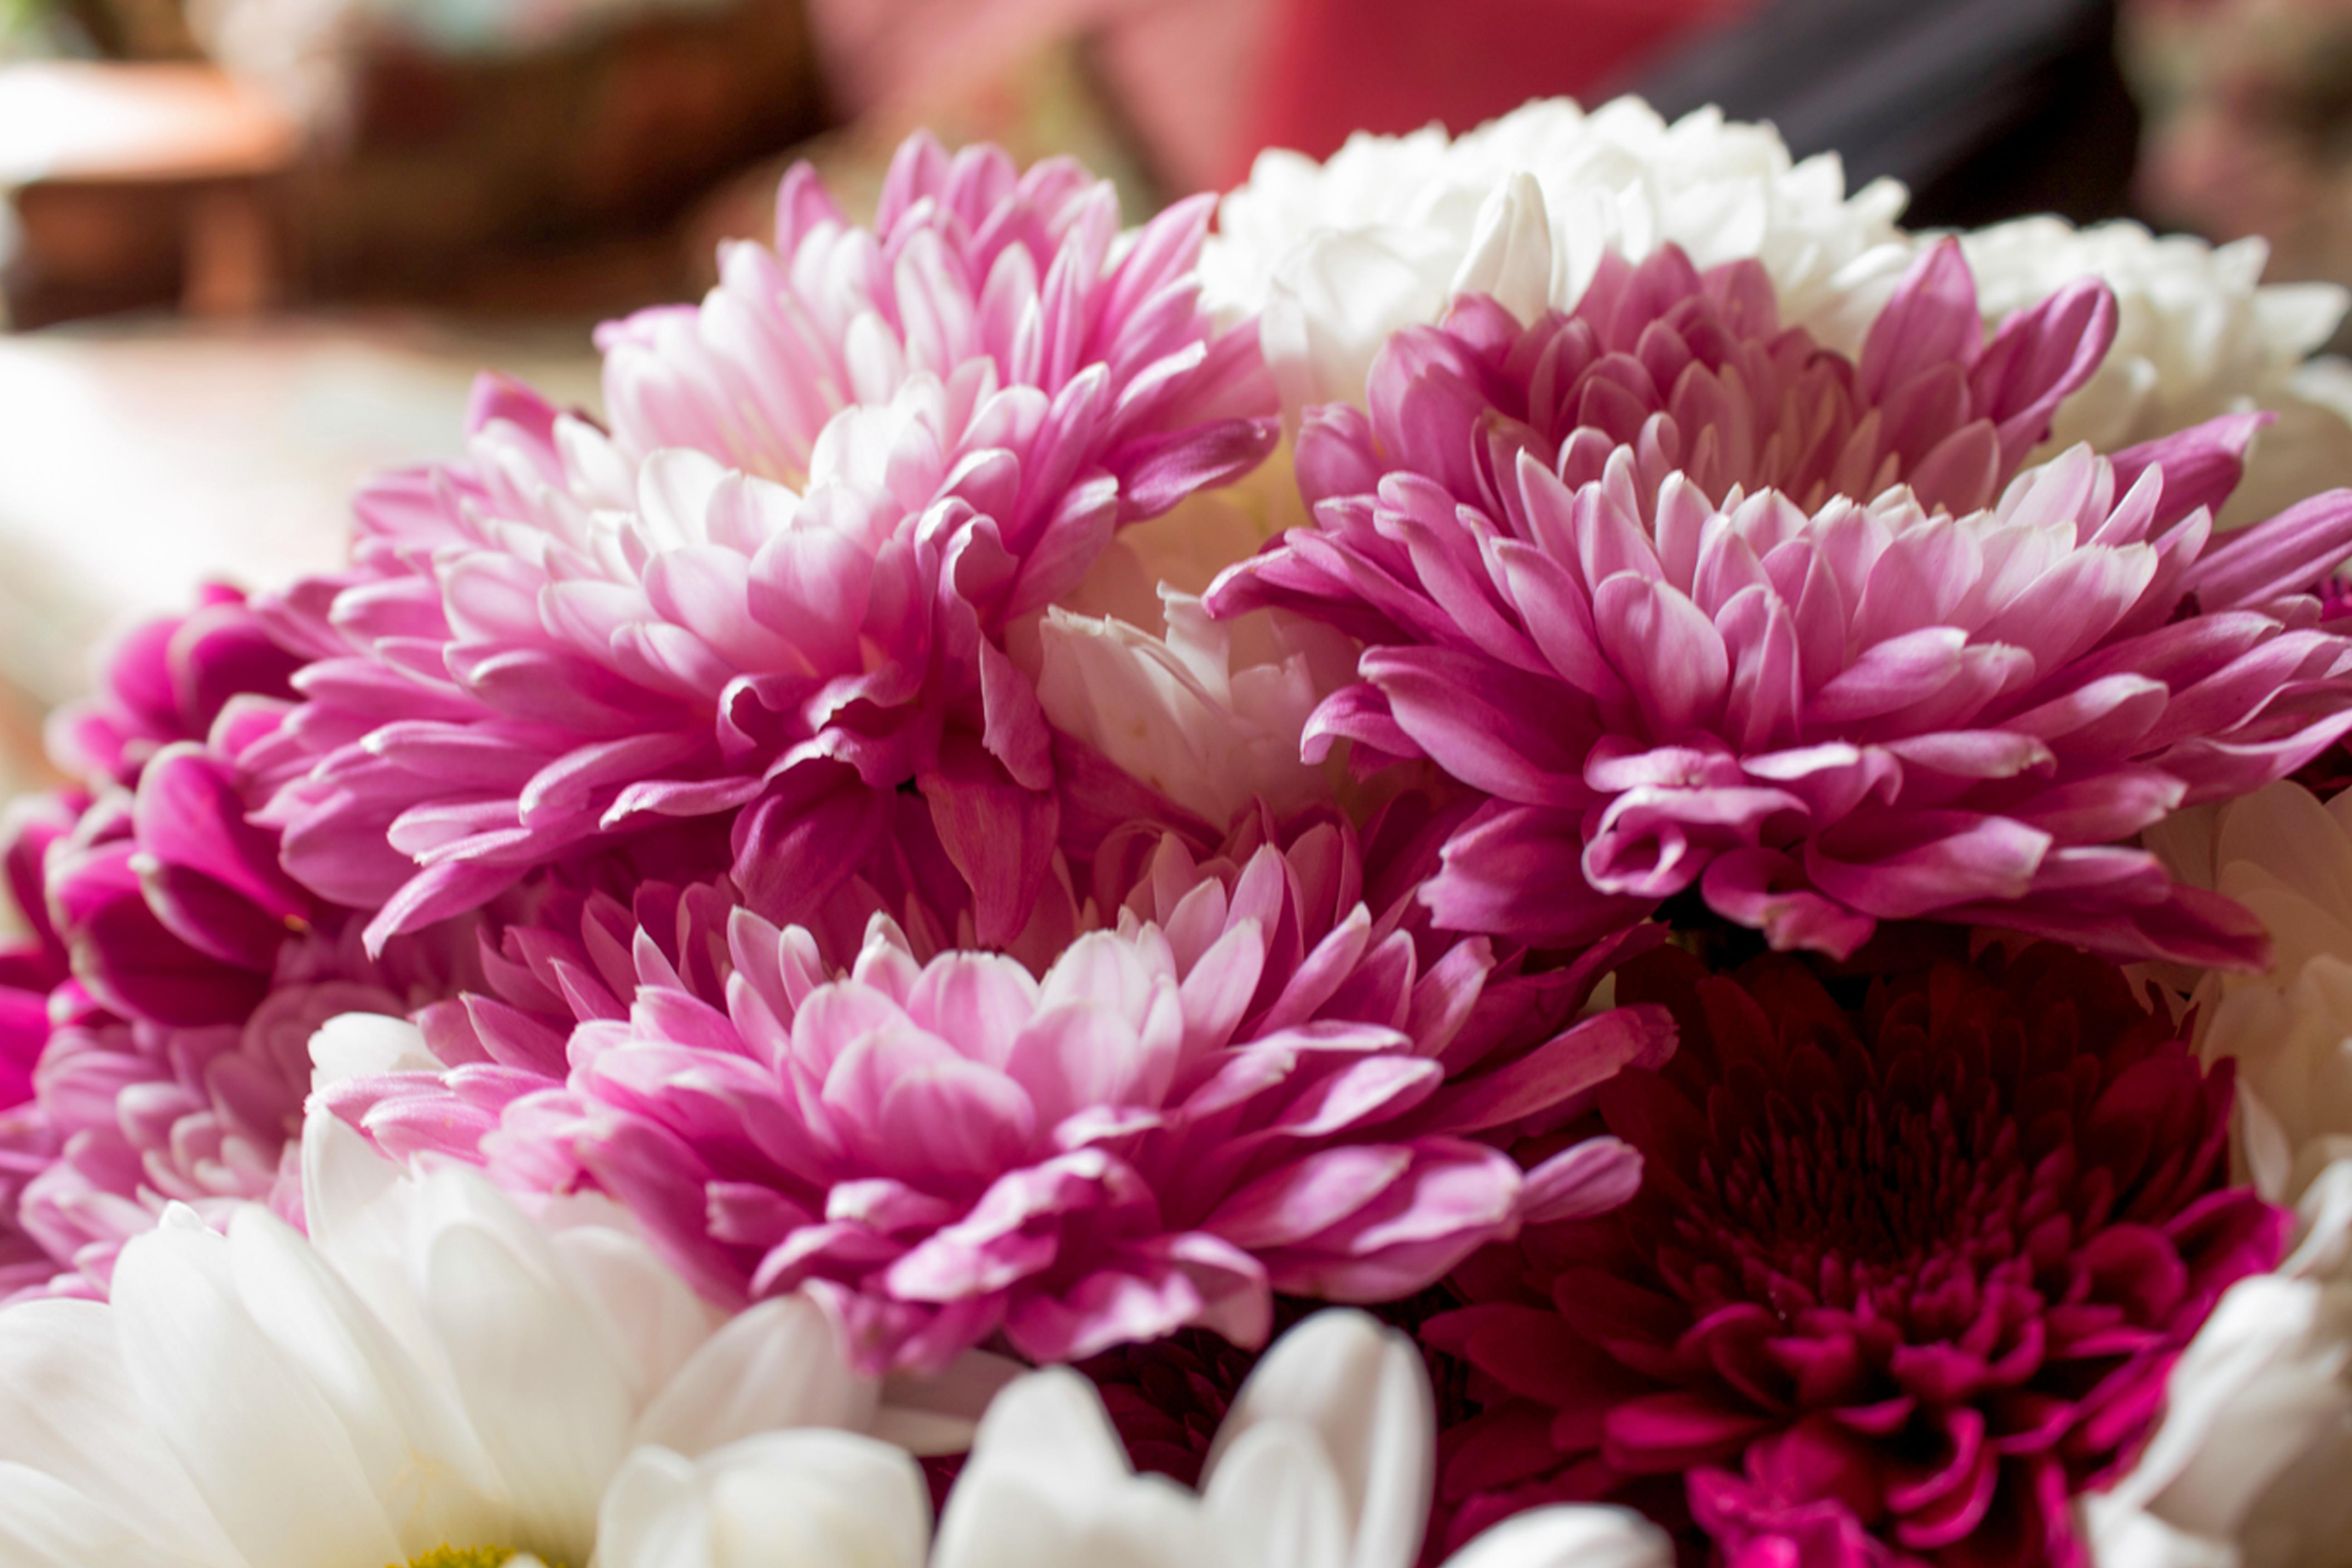 mille-etoiles-home-bloemstukken